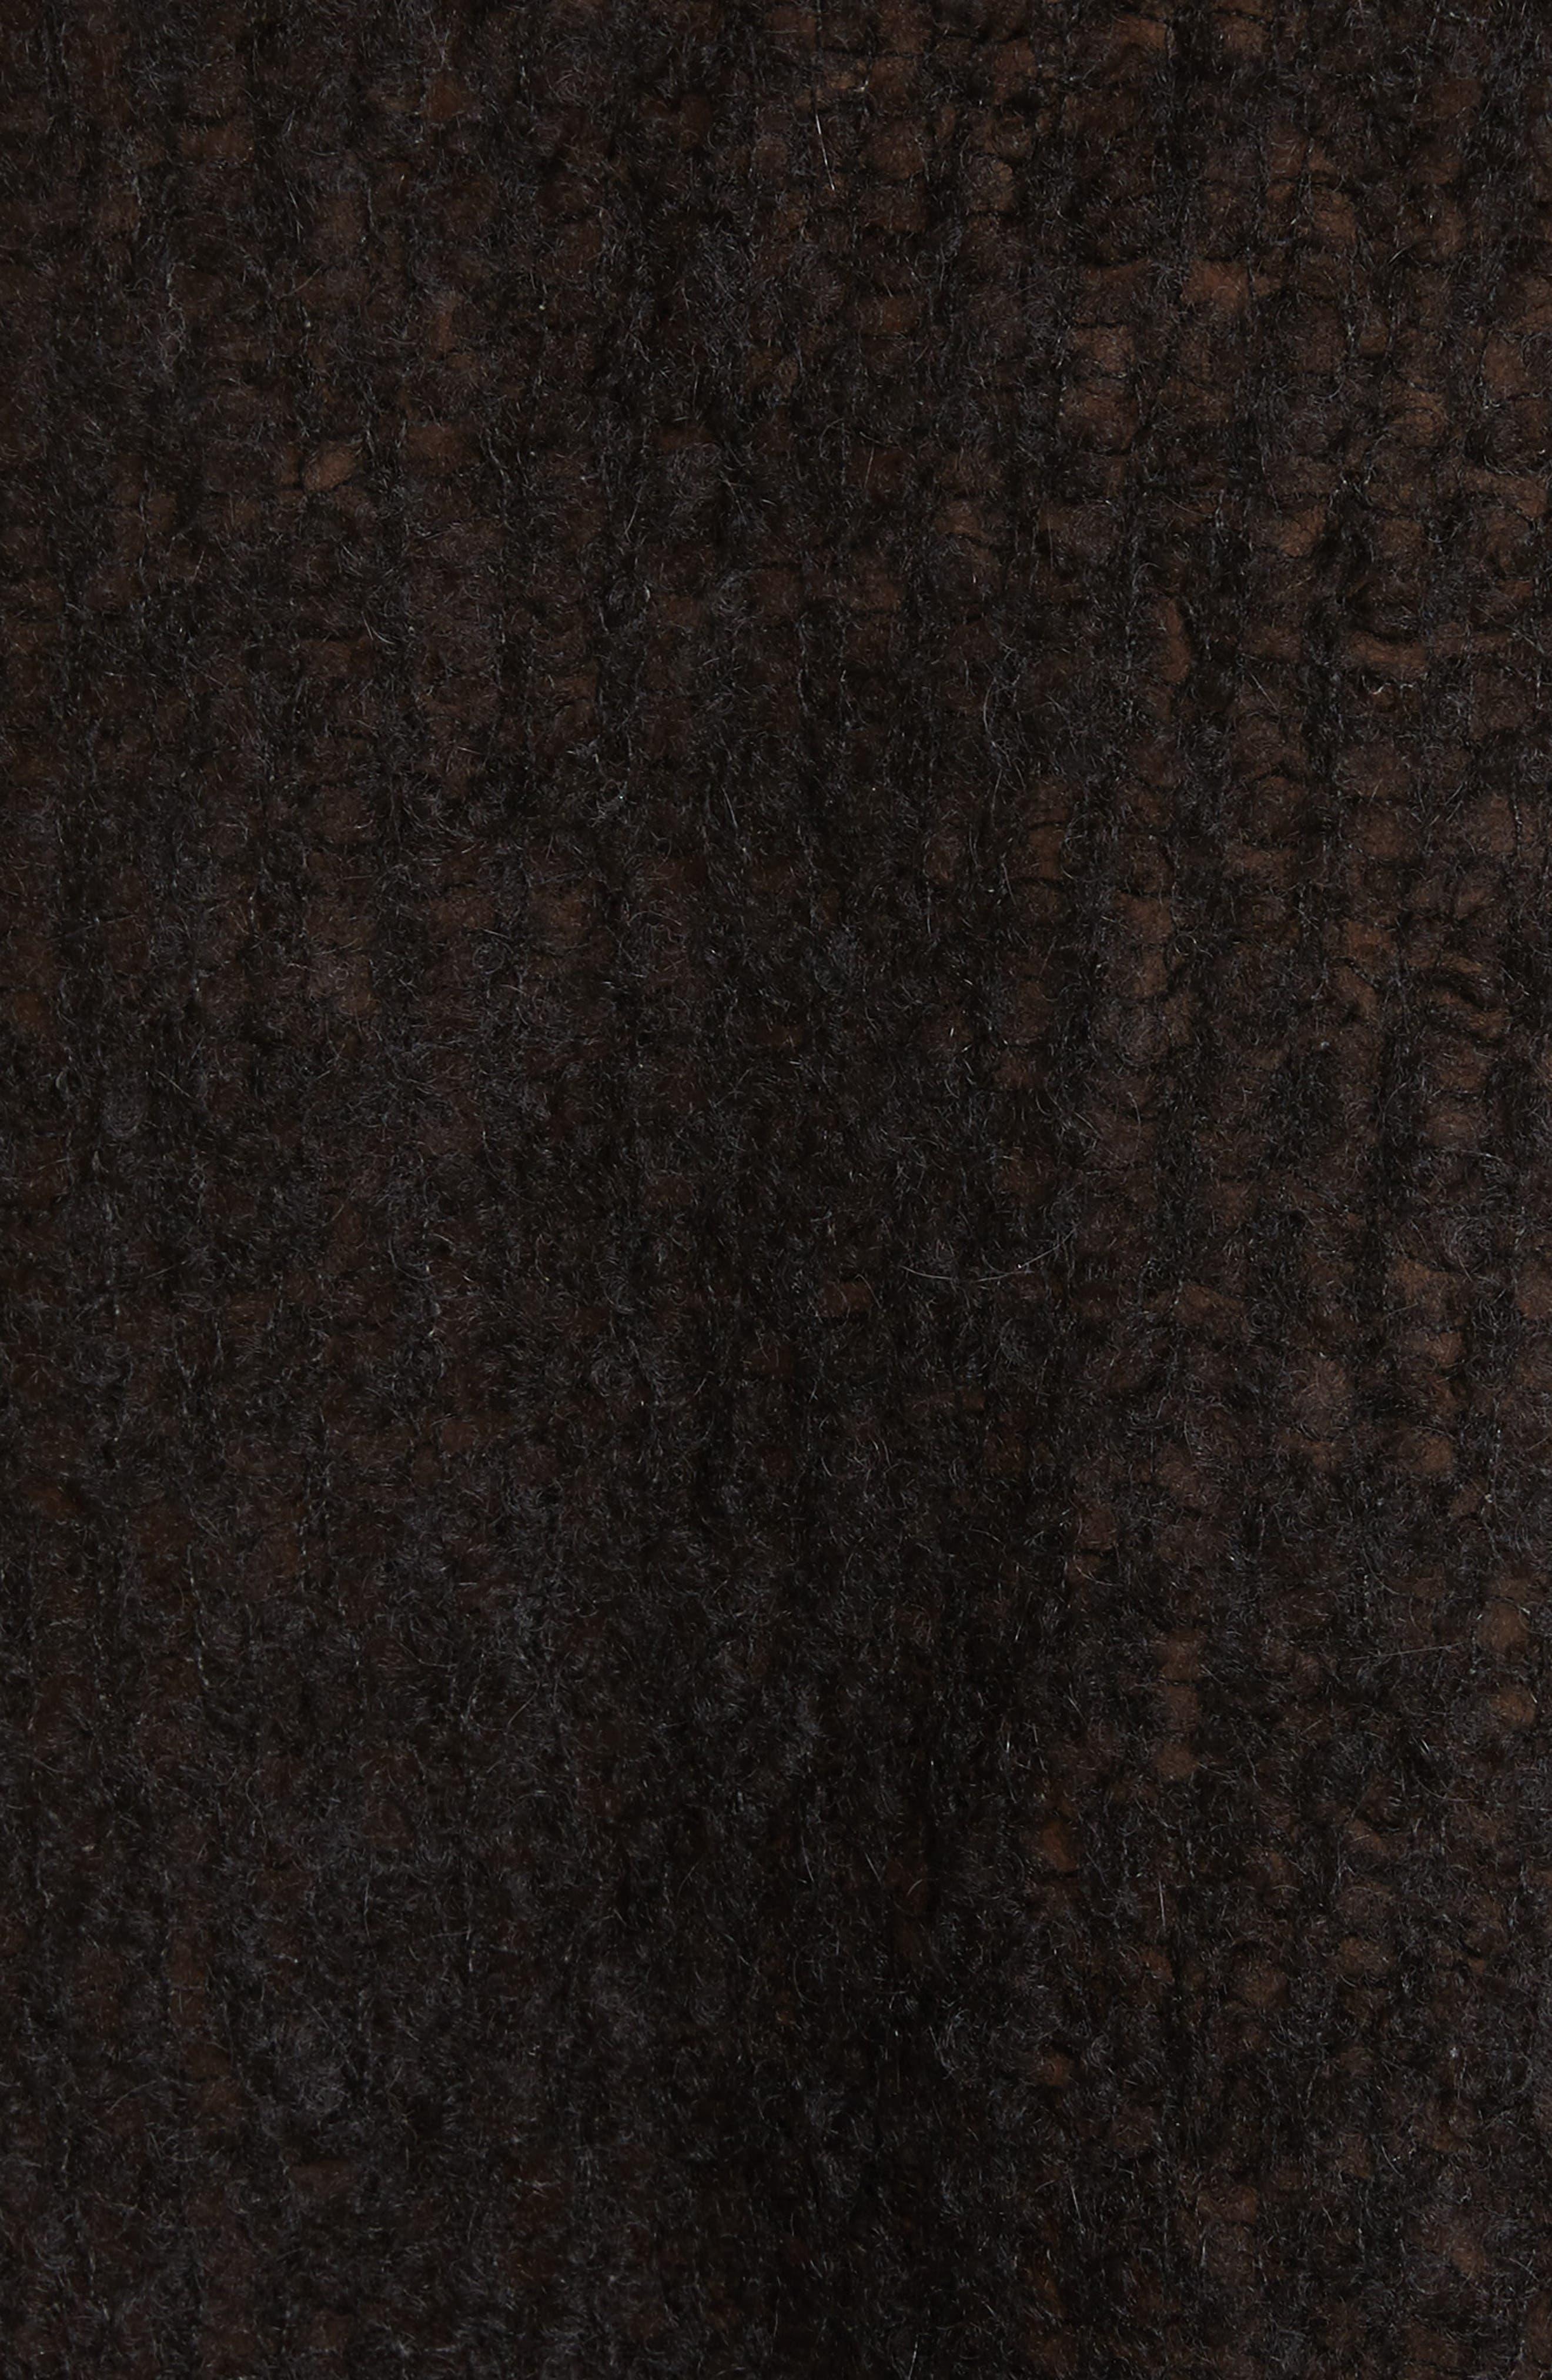 Freda Alpaca Blend Sweater,                             Alternate thumbnail 5, color,                             Black